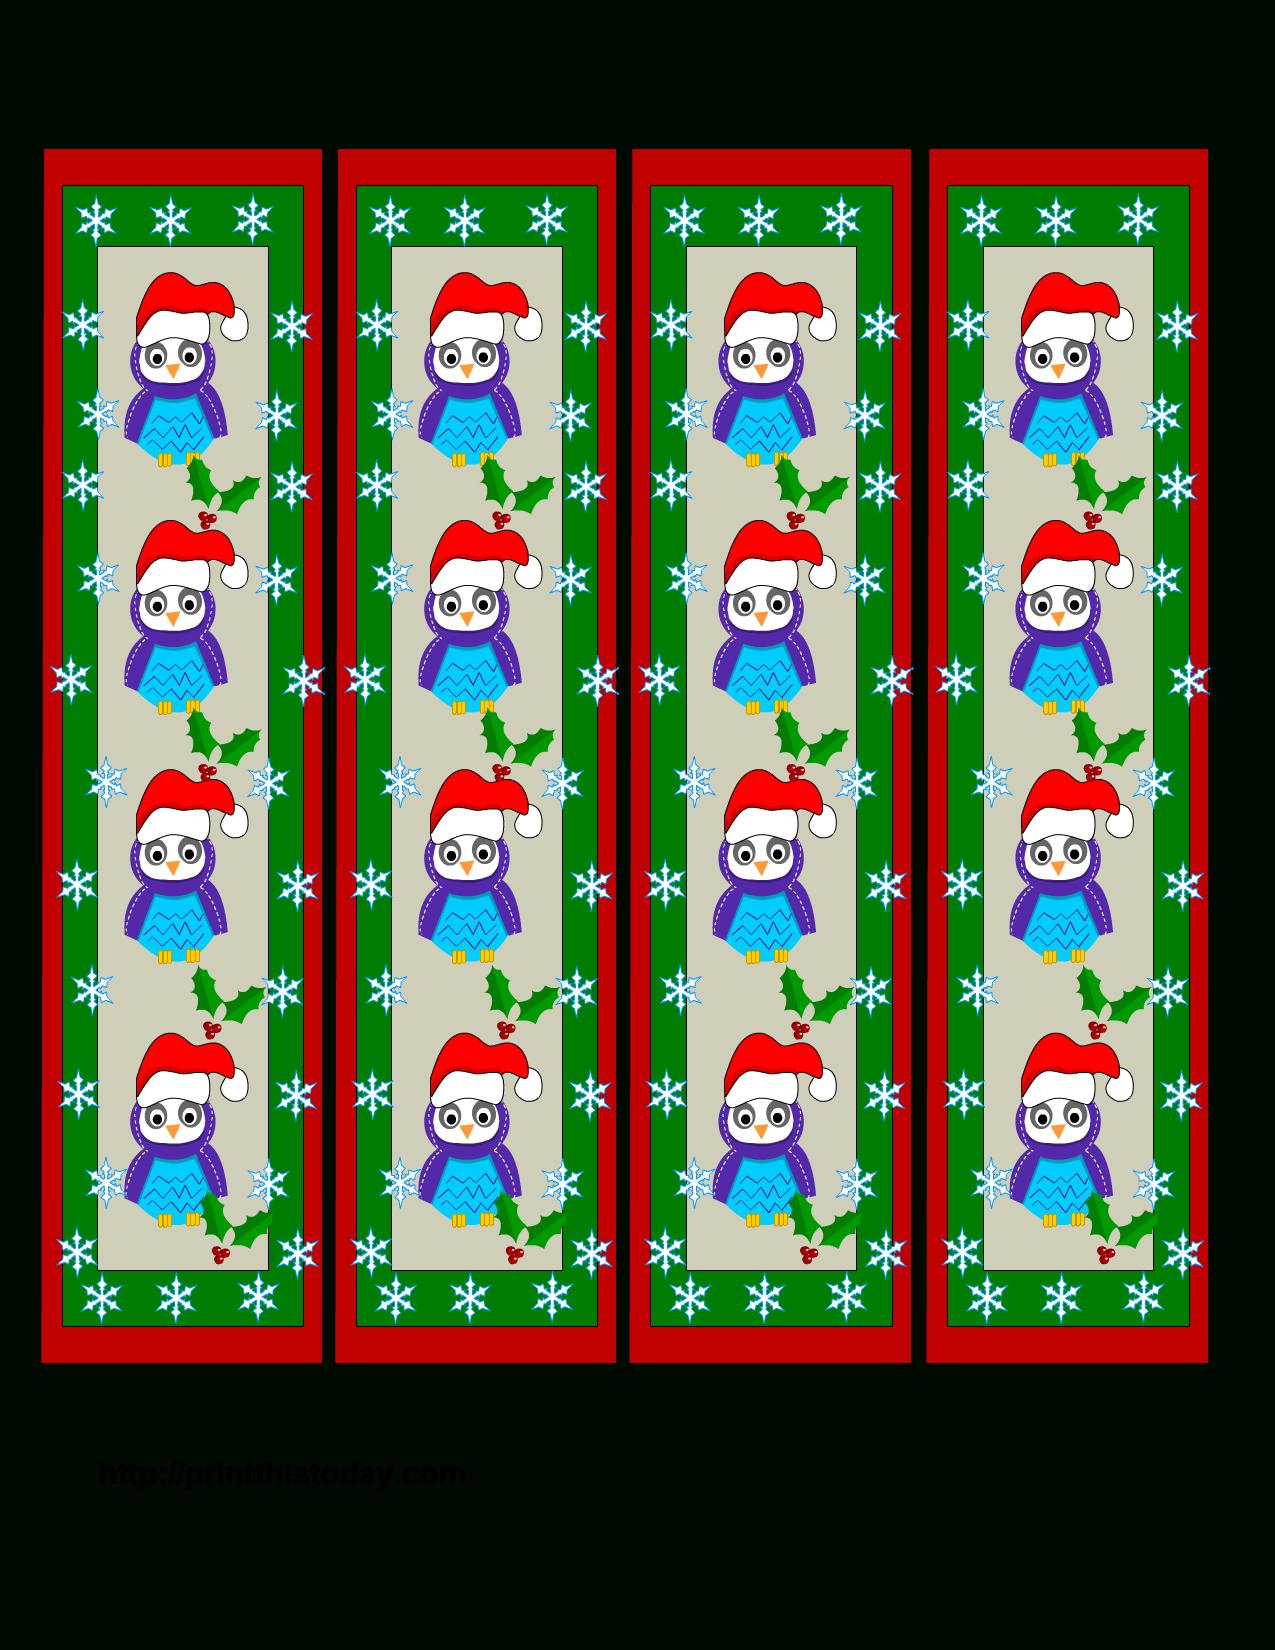 Free Printable Christmas Bookmarks With Owls | Owls For Kaelie - Free Printable Owl Bookmarks